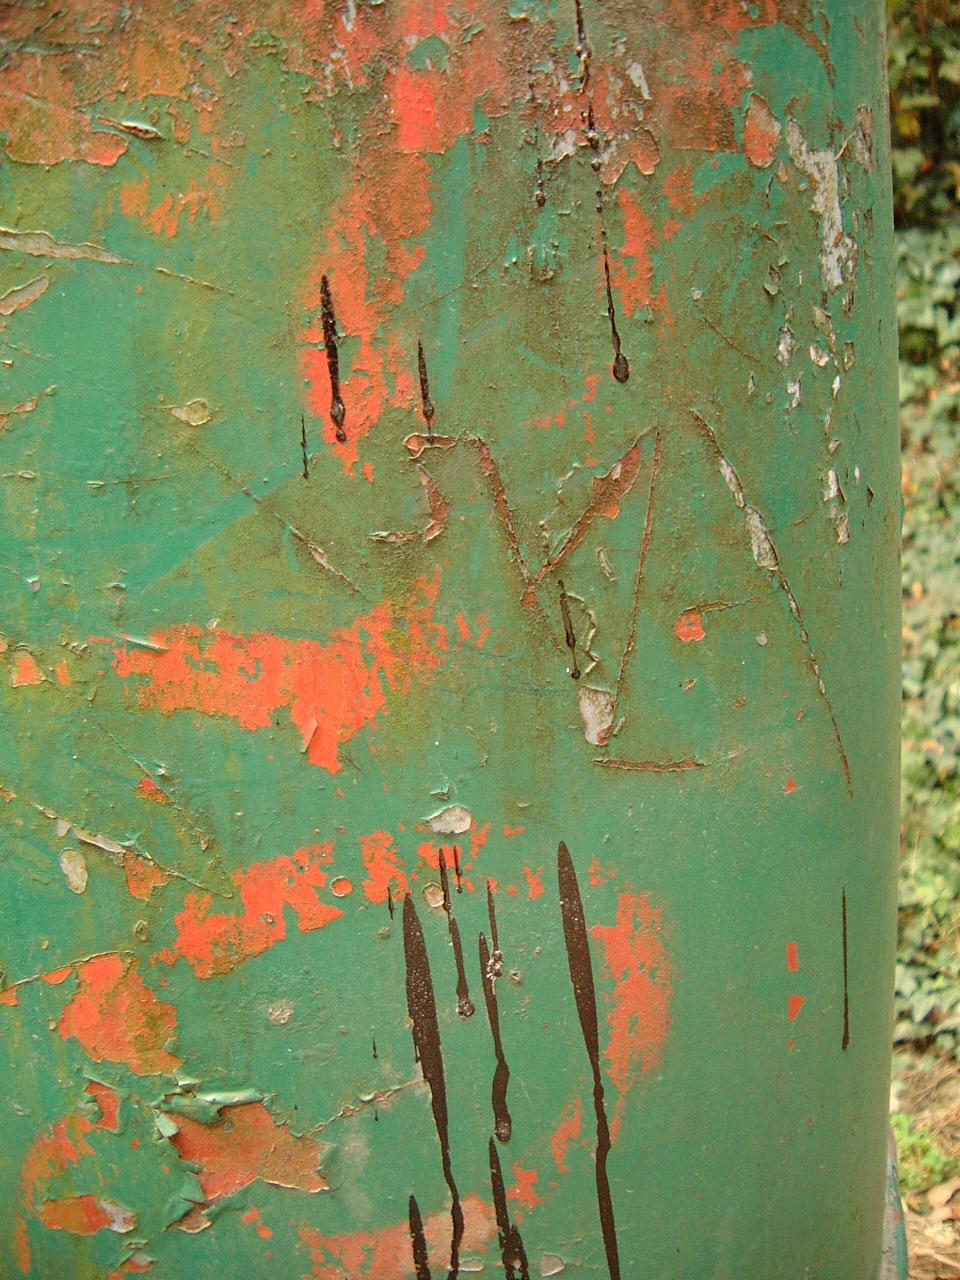 maartent rusty surface green old paint flacked metal steel